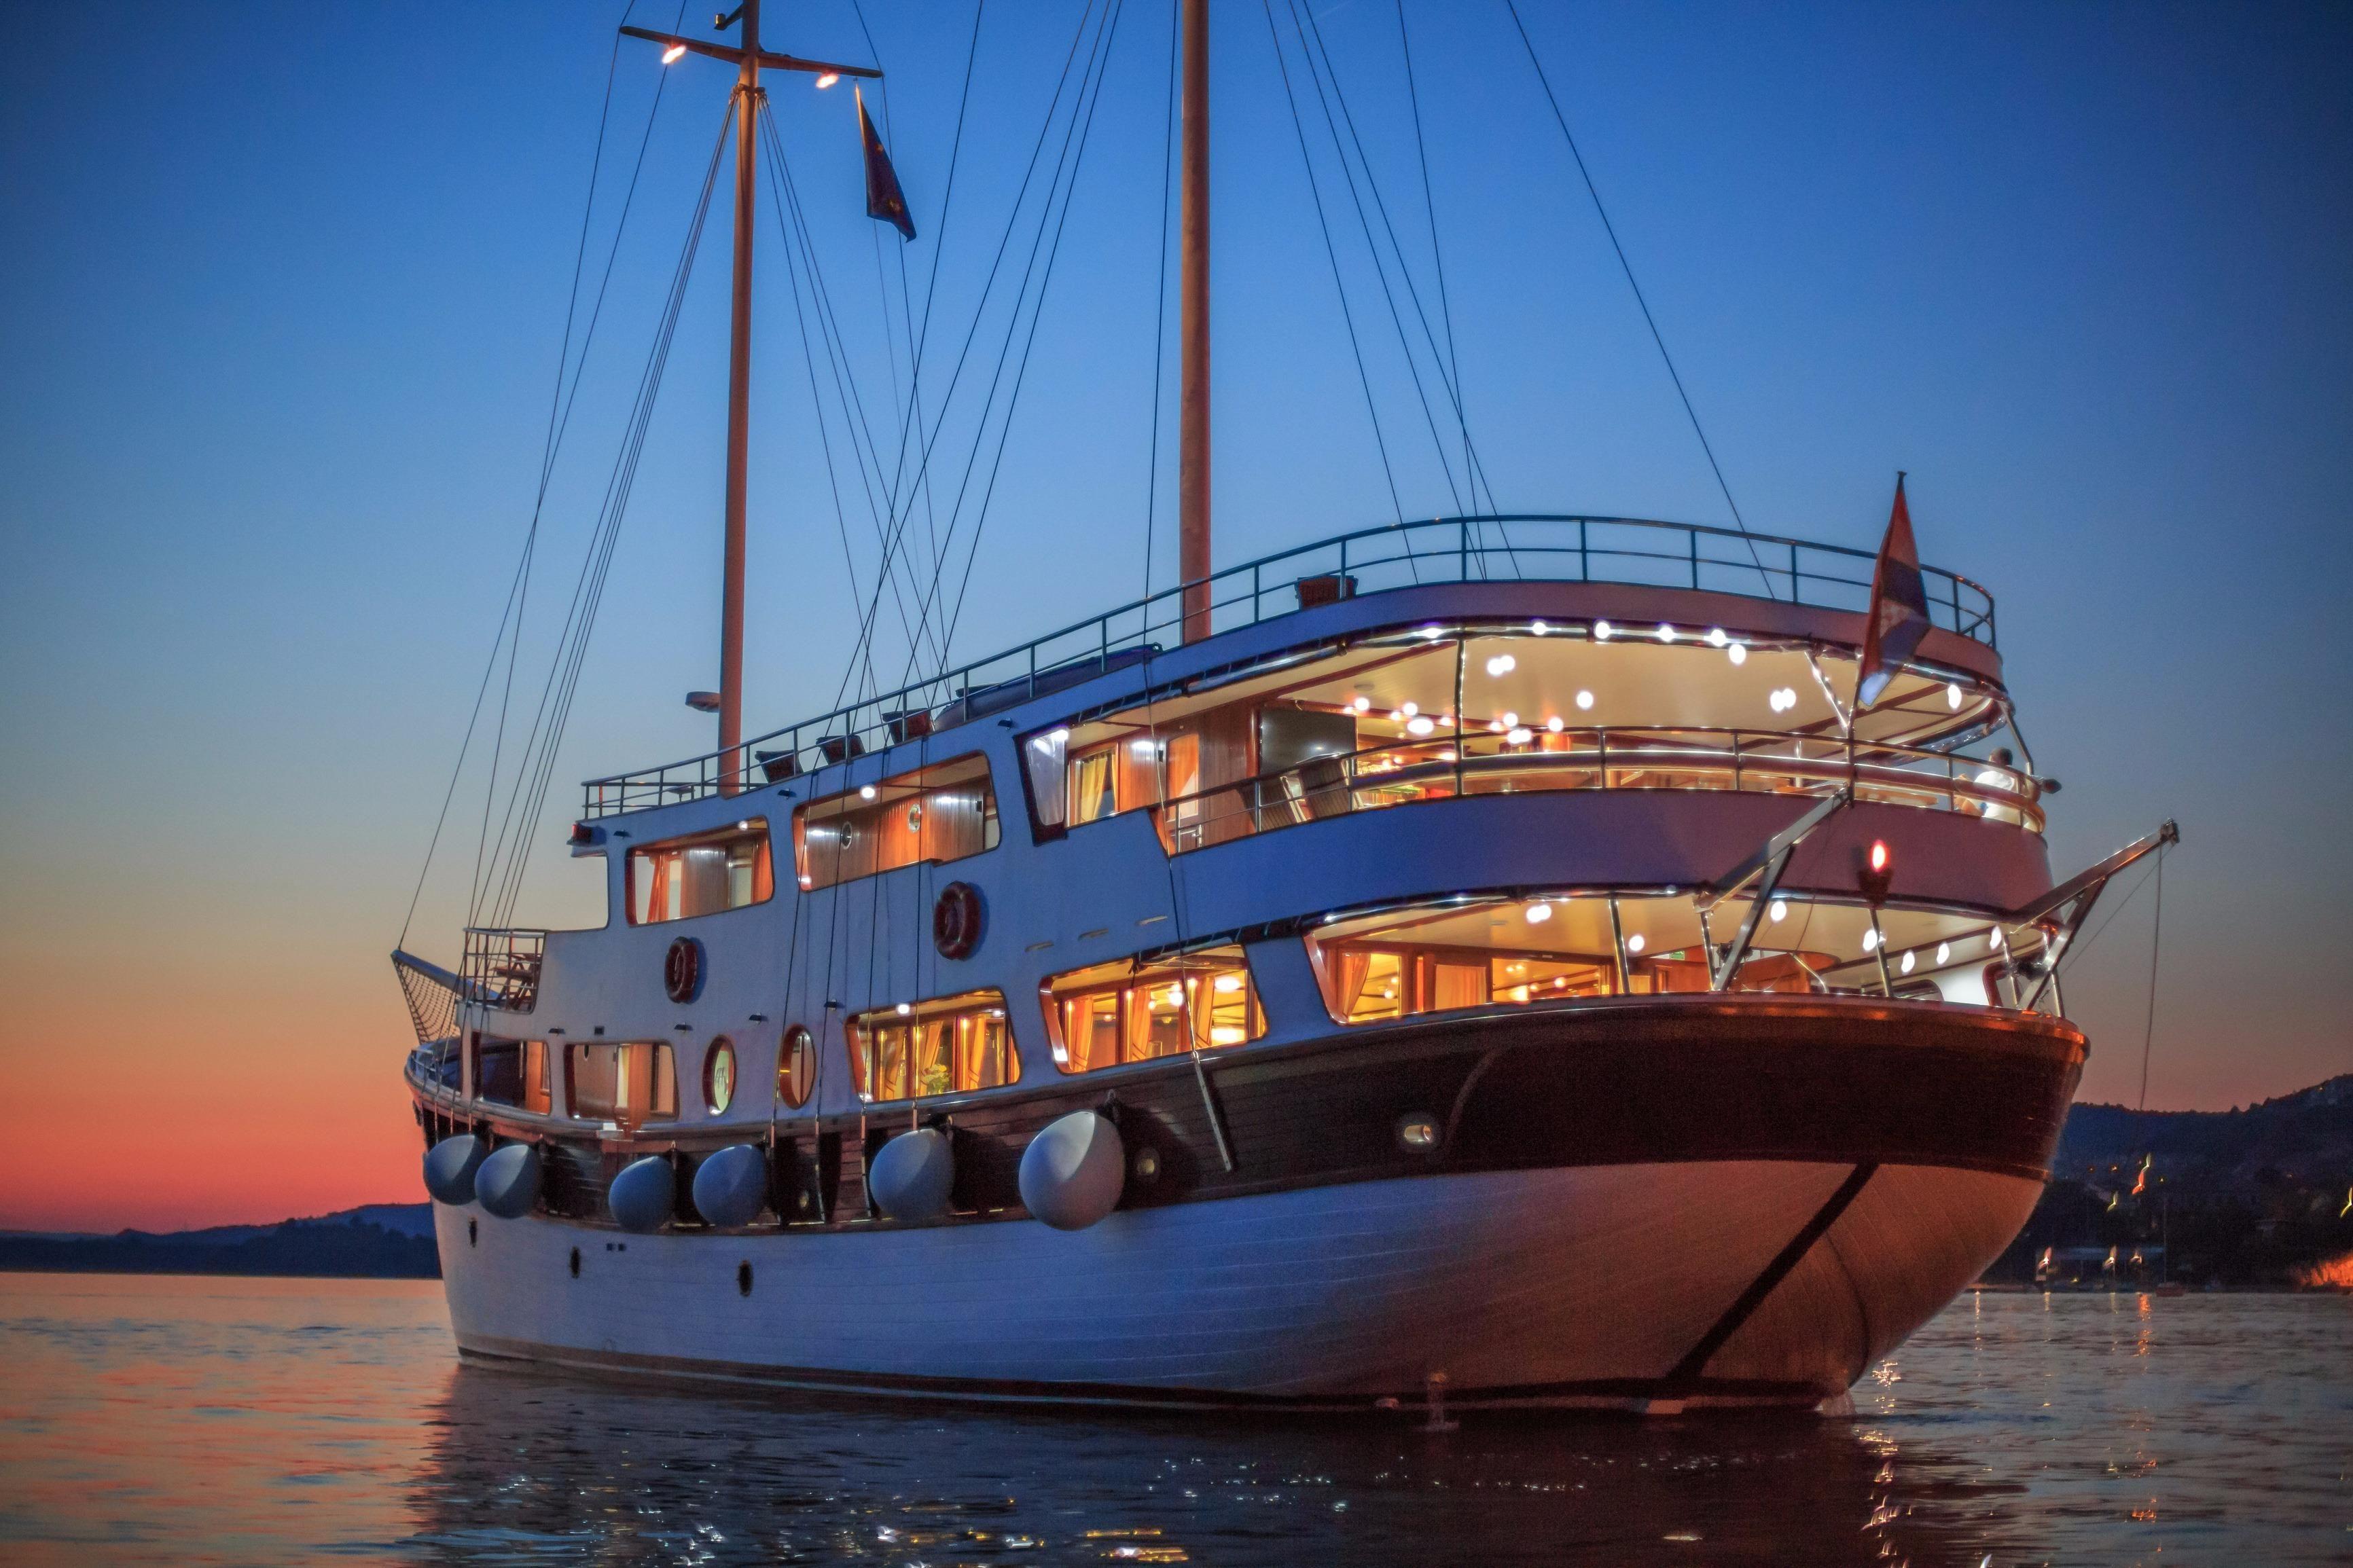 2013 Marina Vinici Wooden Schooner Cruise Ship Power Boat